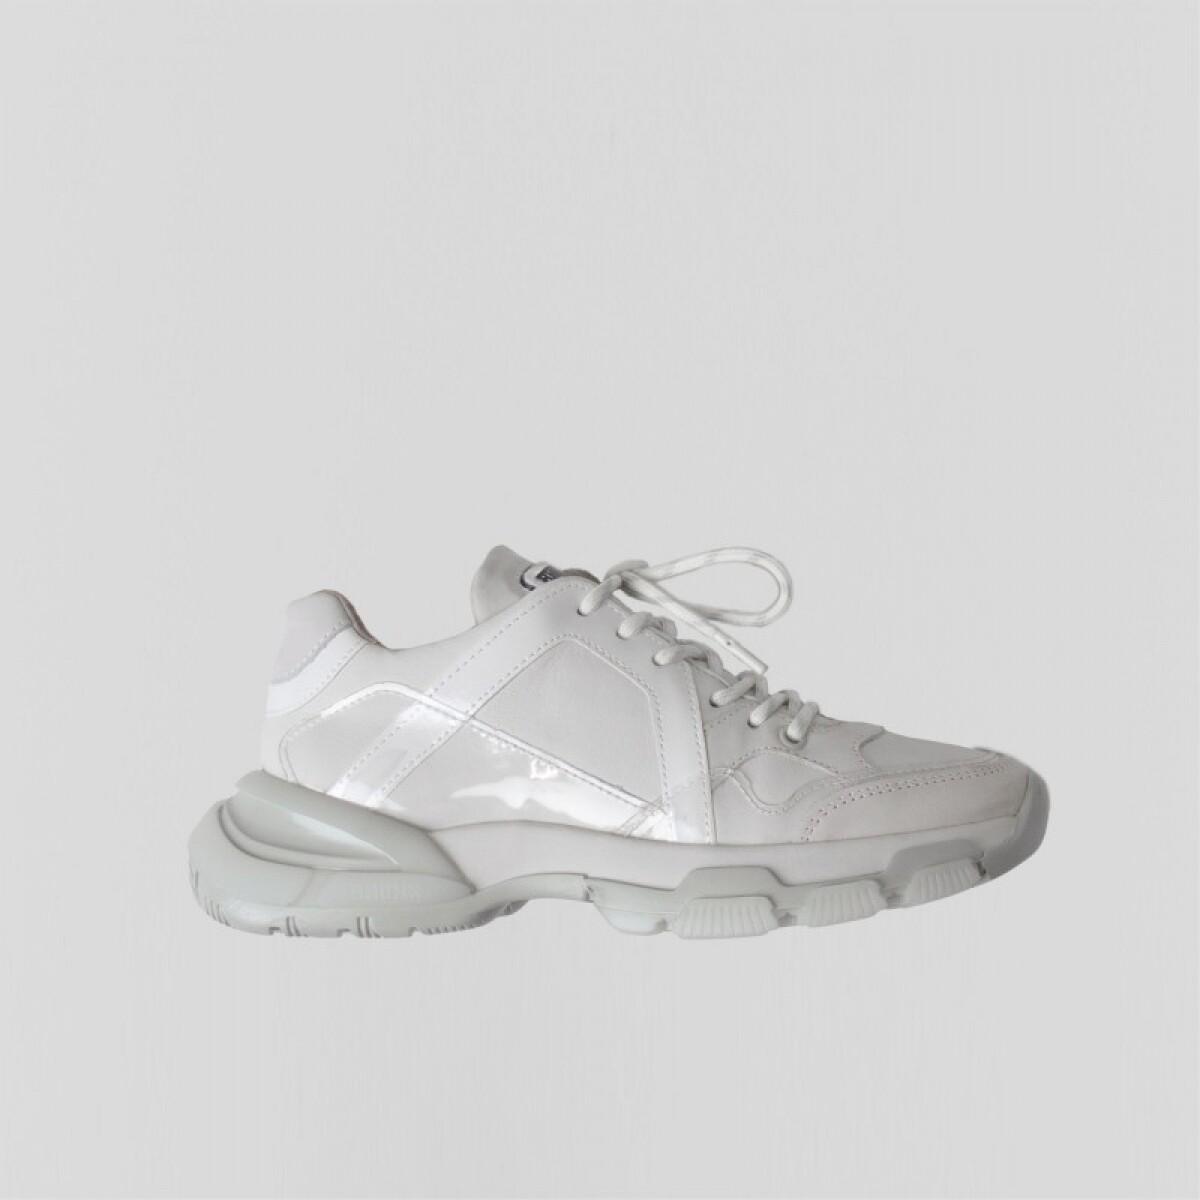 66295-VB off-white